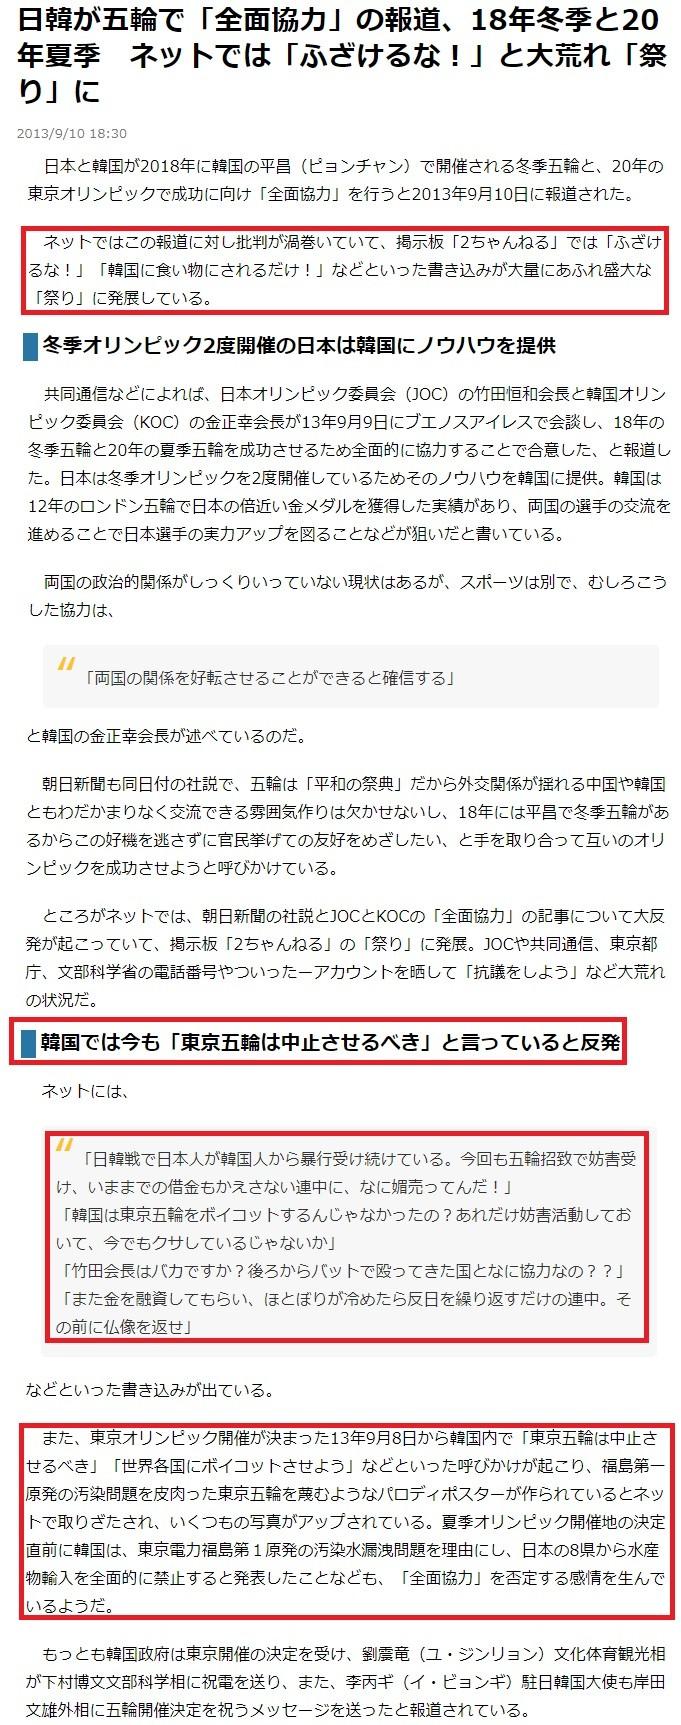 姦国の準政府公認工作活動機関VANKが東京五輪の招致活動を妨害5